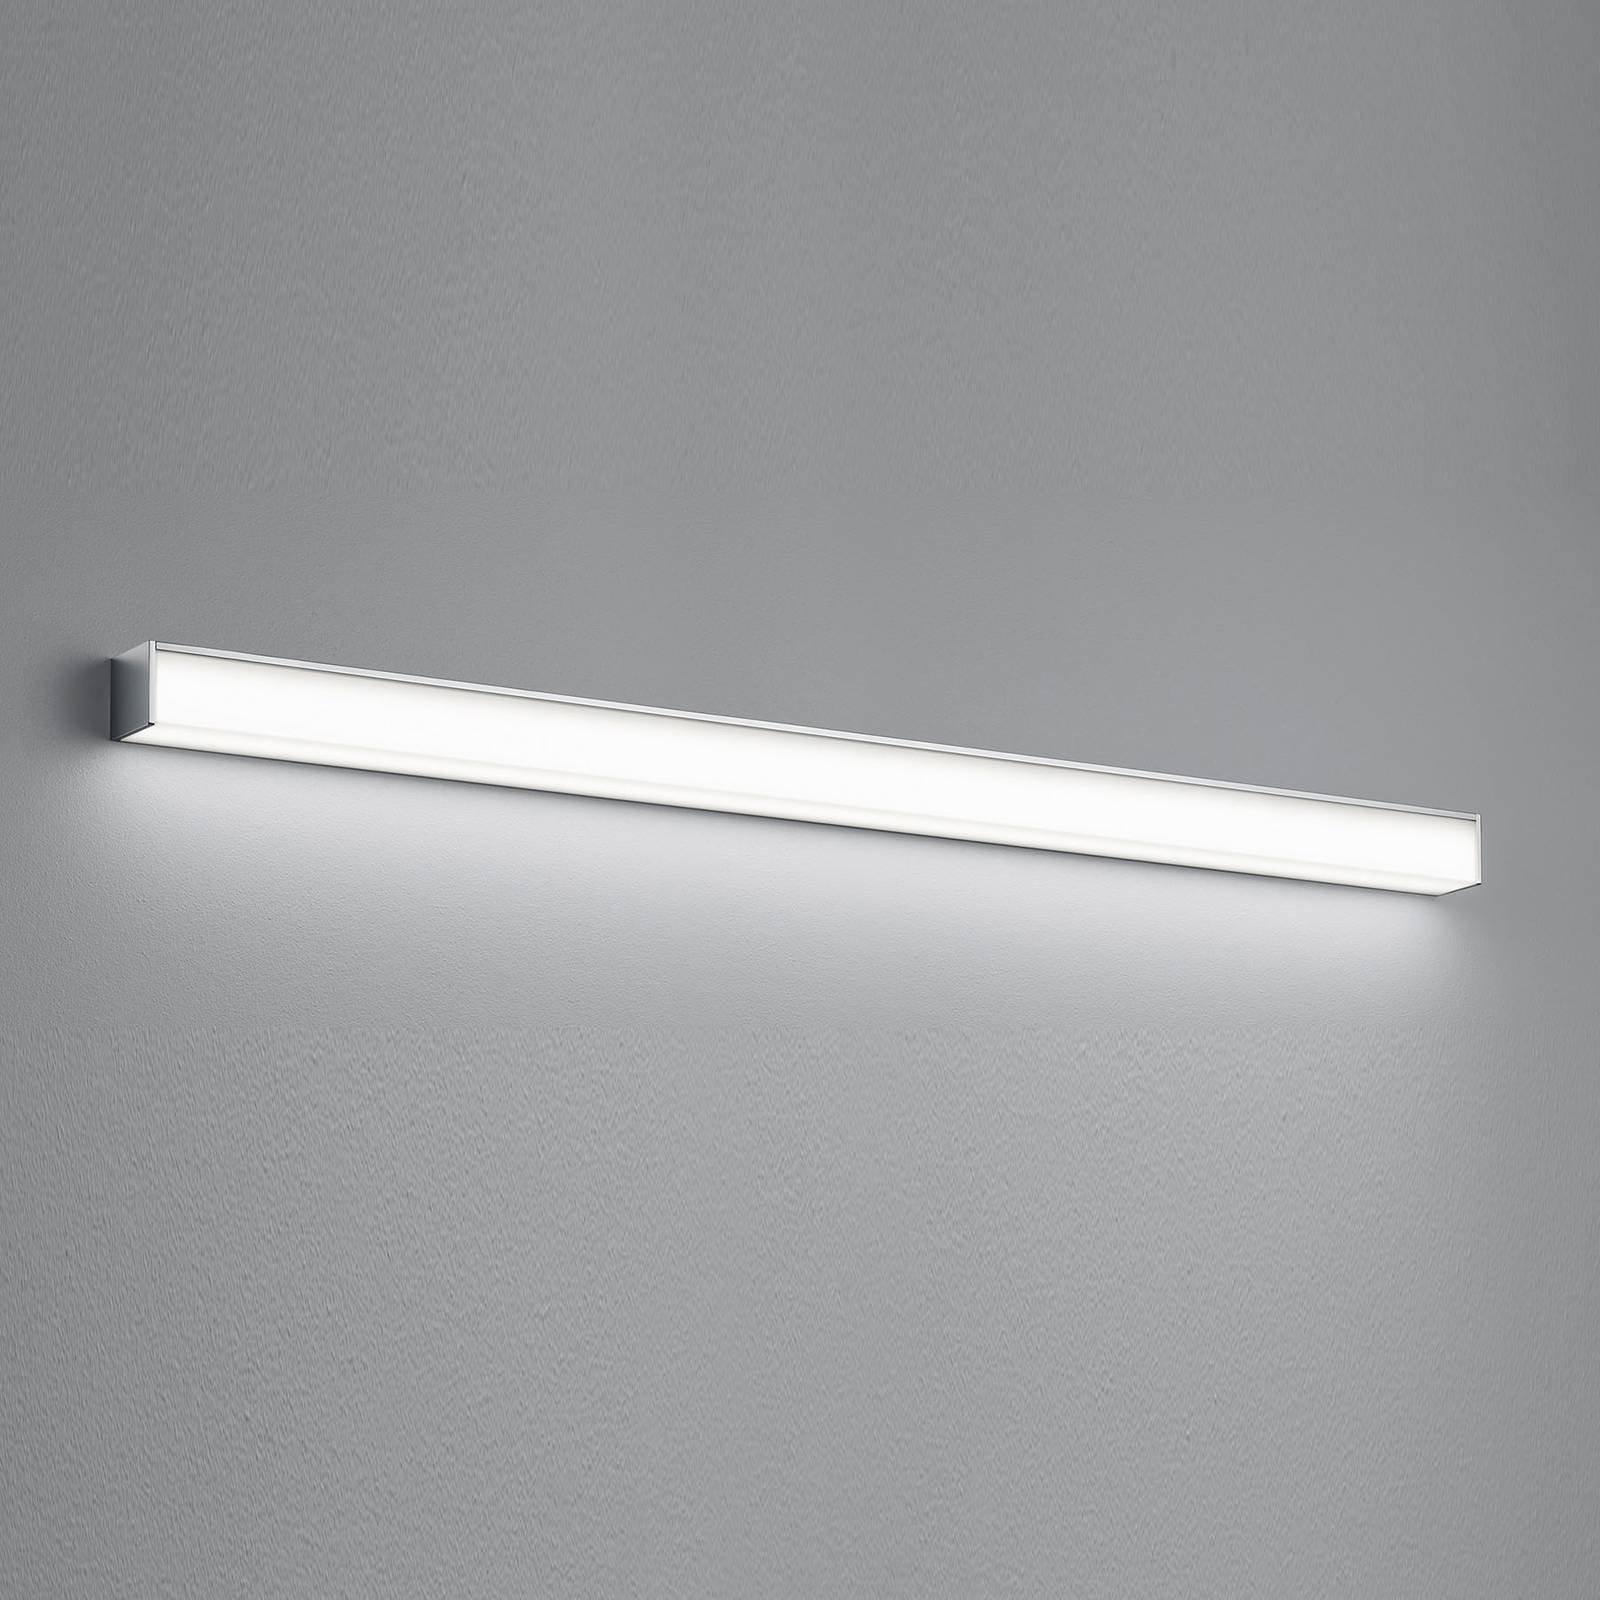 Helestra Nok LED-speillampe, 120 cm